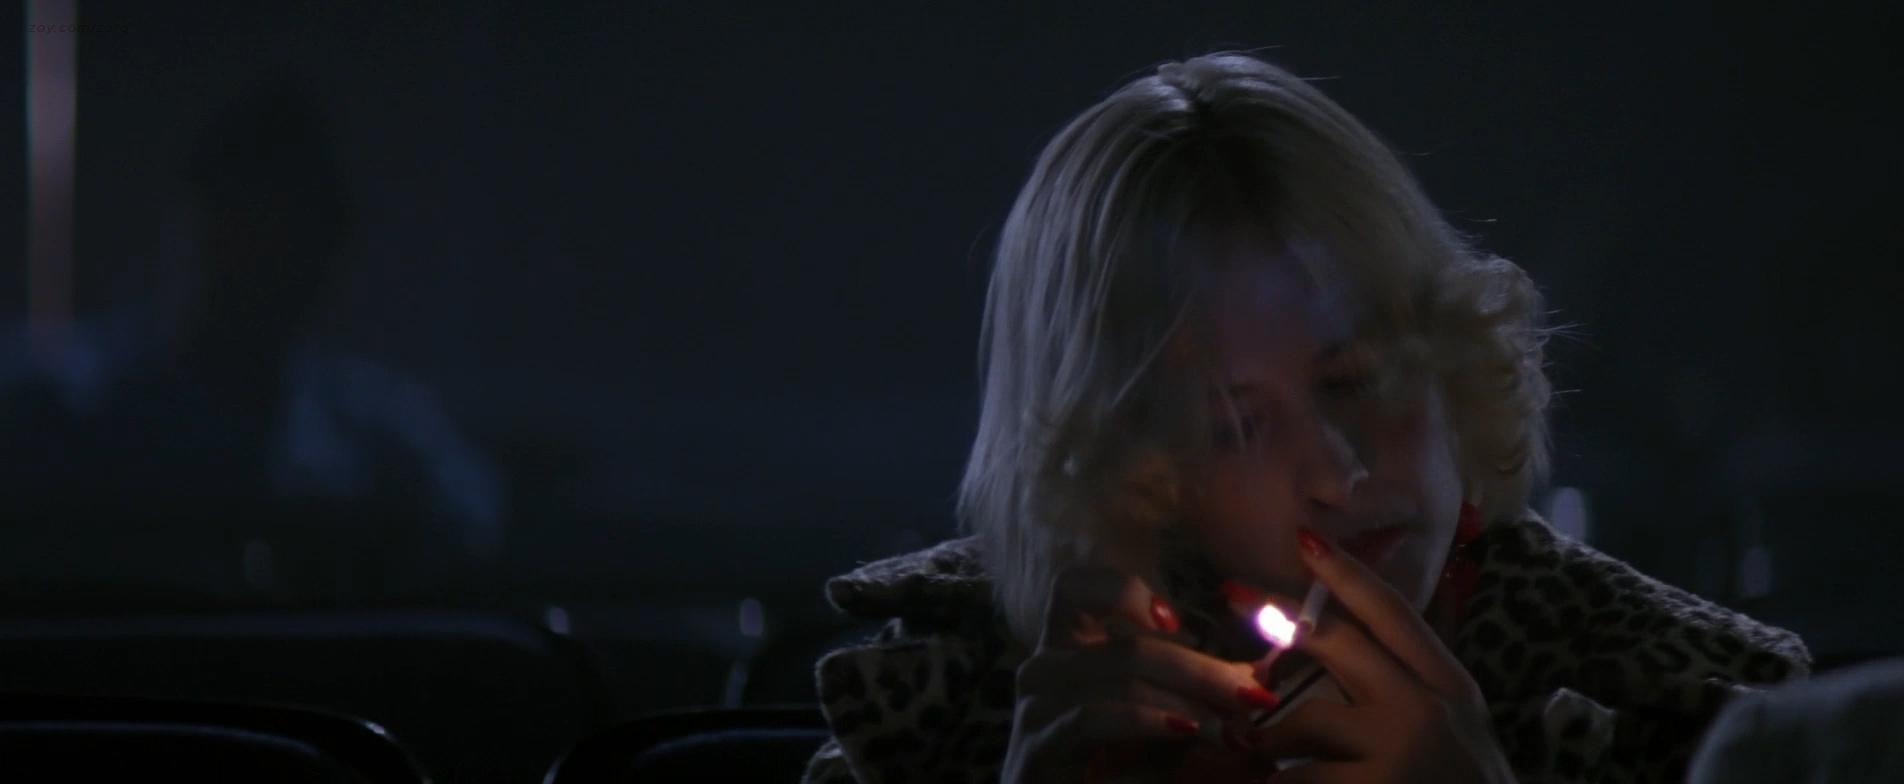 Patricia Arquette nude busty and sexy - True Romance (1993) hd1080p (9)